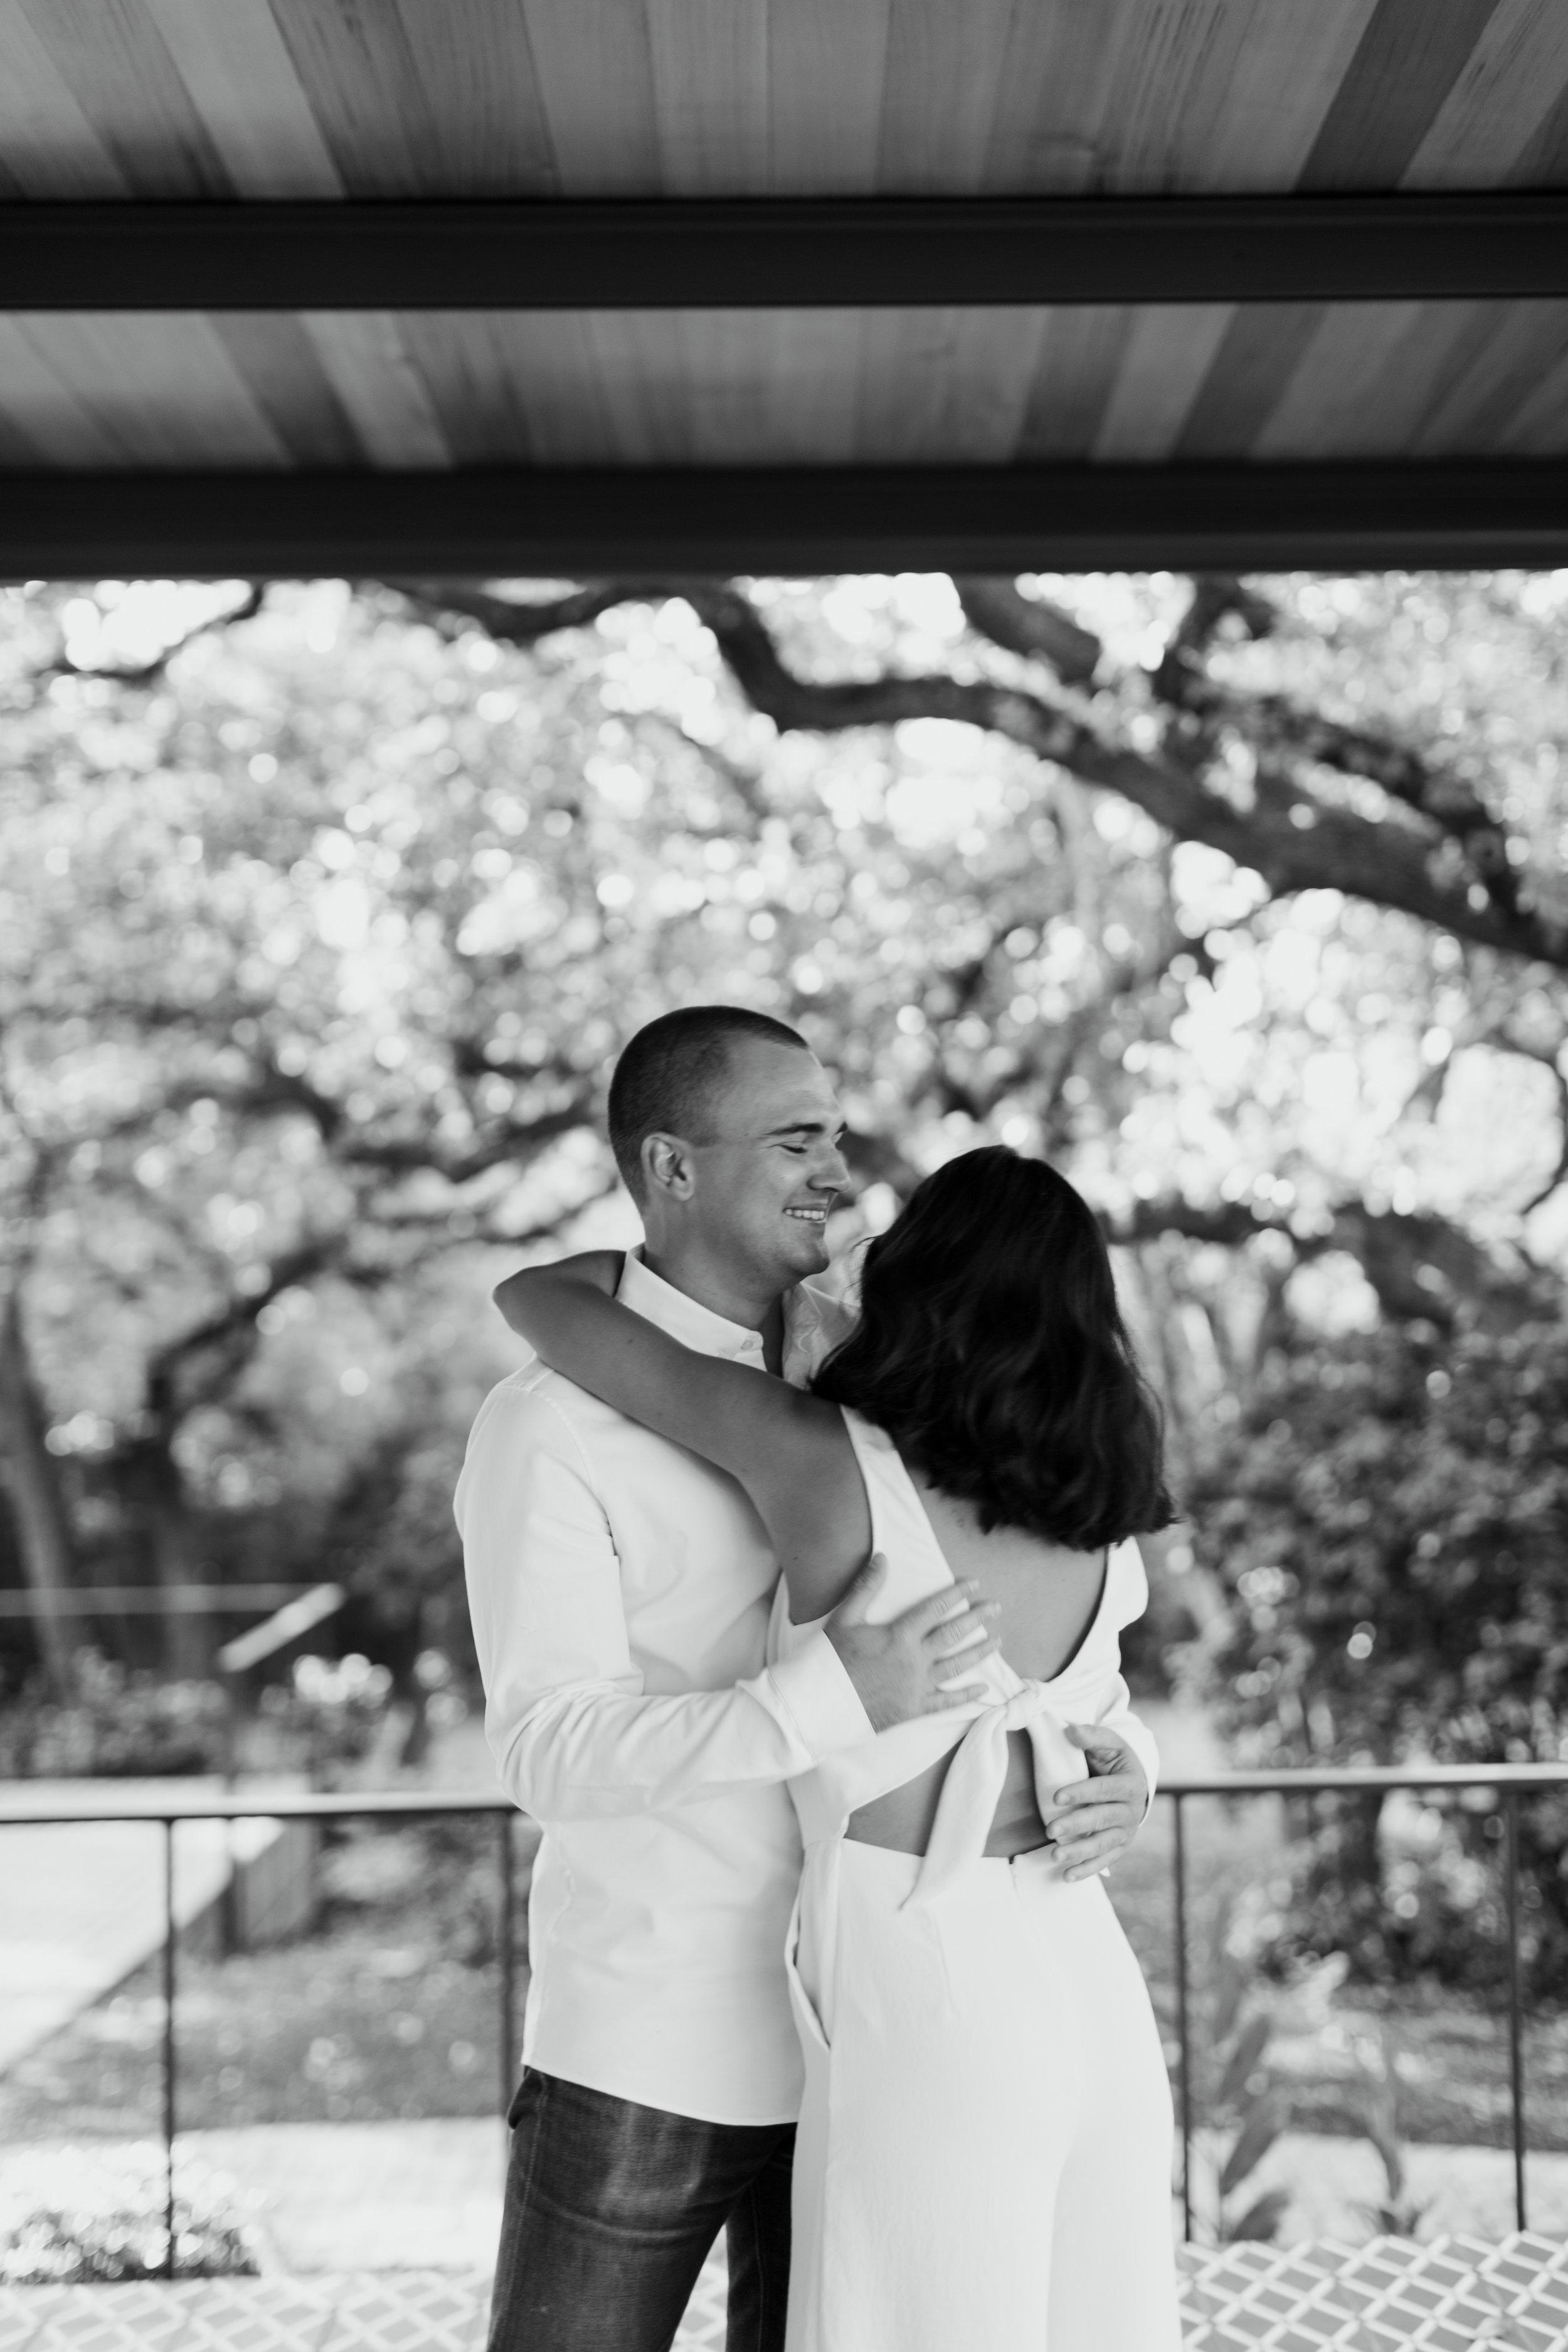 Paige-Newton-Photography-Engagement-Session-Austin-Manana-Coffee-Matties0016.jpg